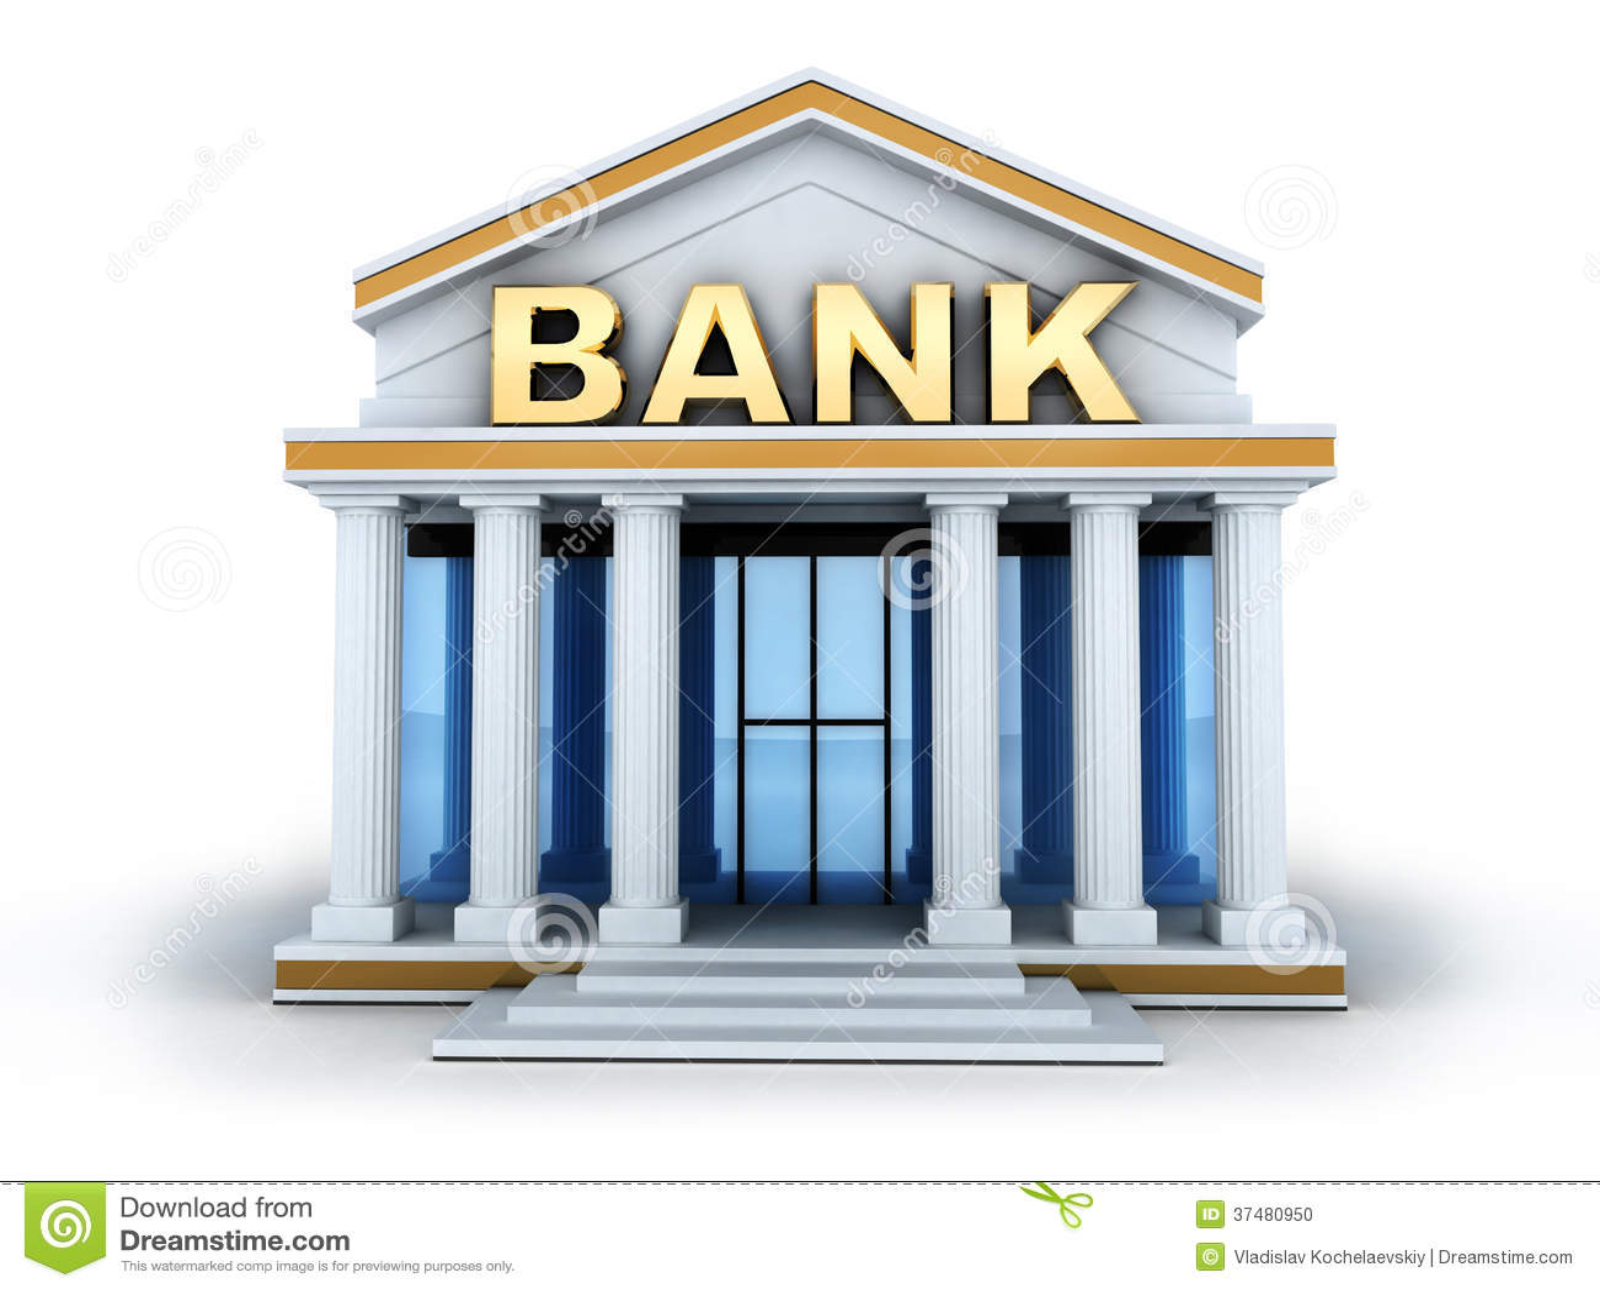 build bank stock illustration illustration of financial banking clip art free images banking clip art images